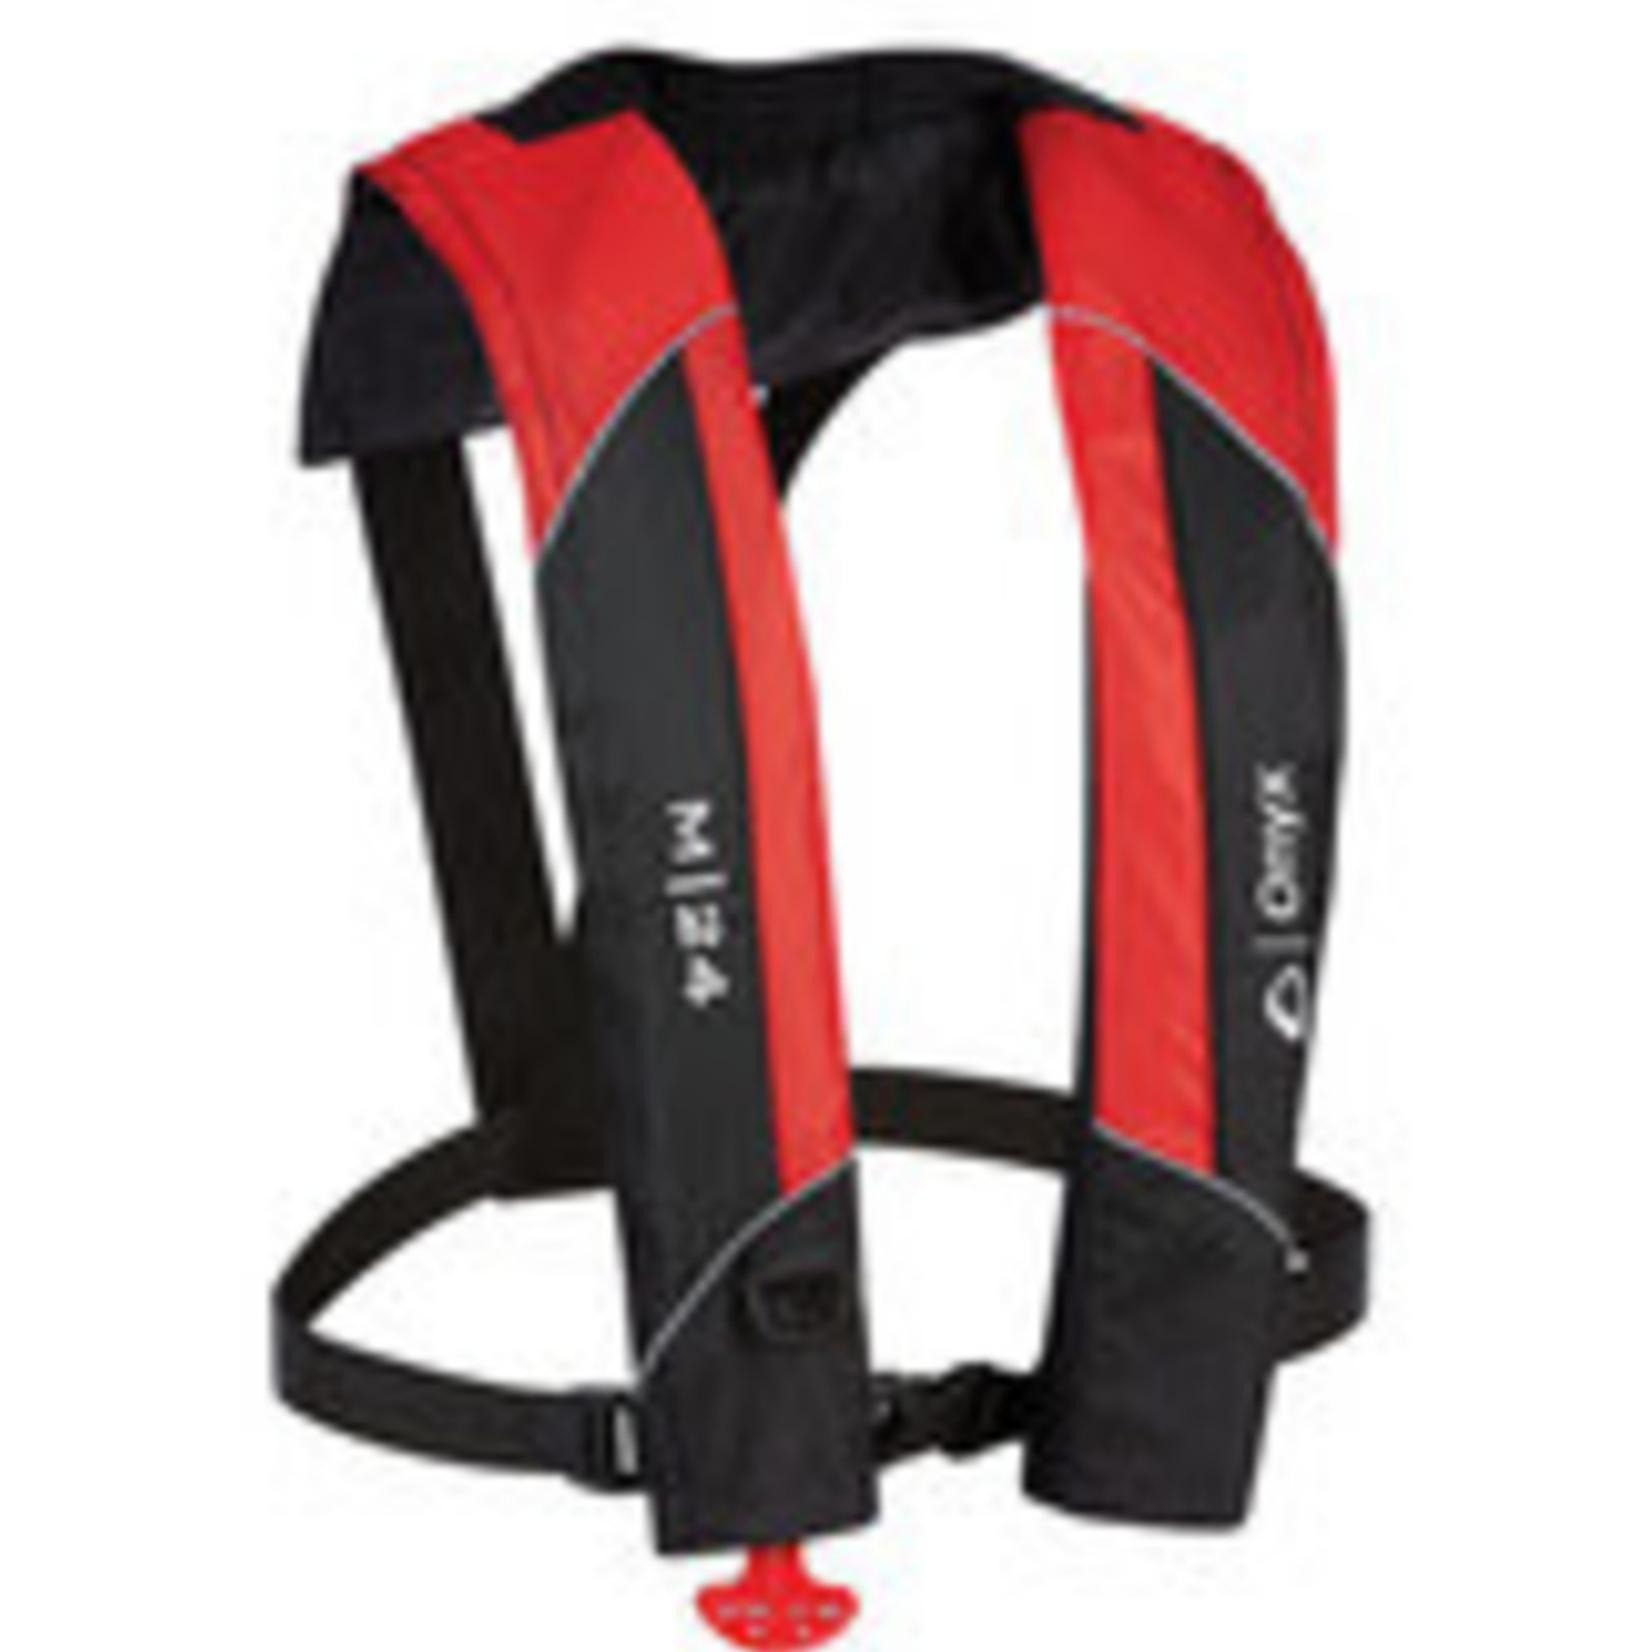 Onyx Onyx M-24 Belt Pack Manual Inflatable Life Jacket (PFD)